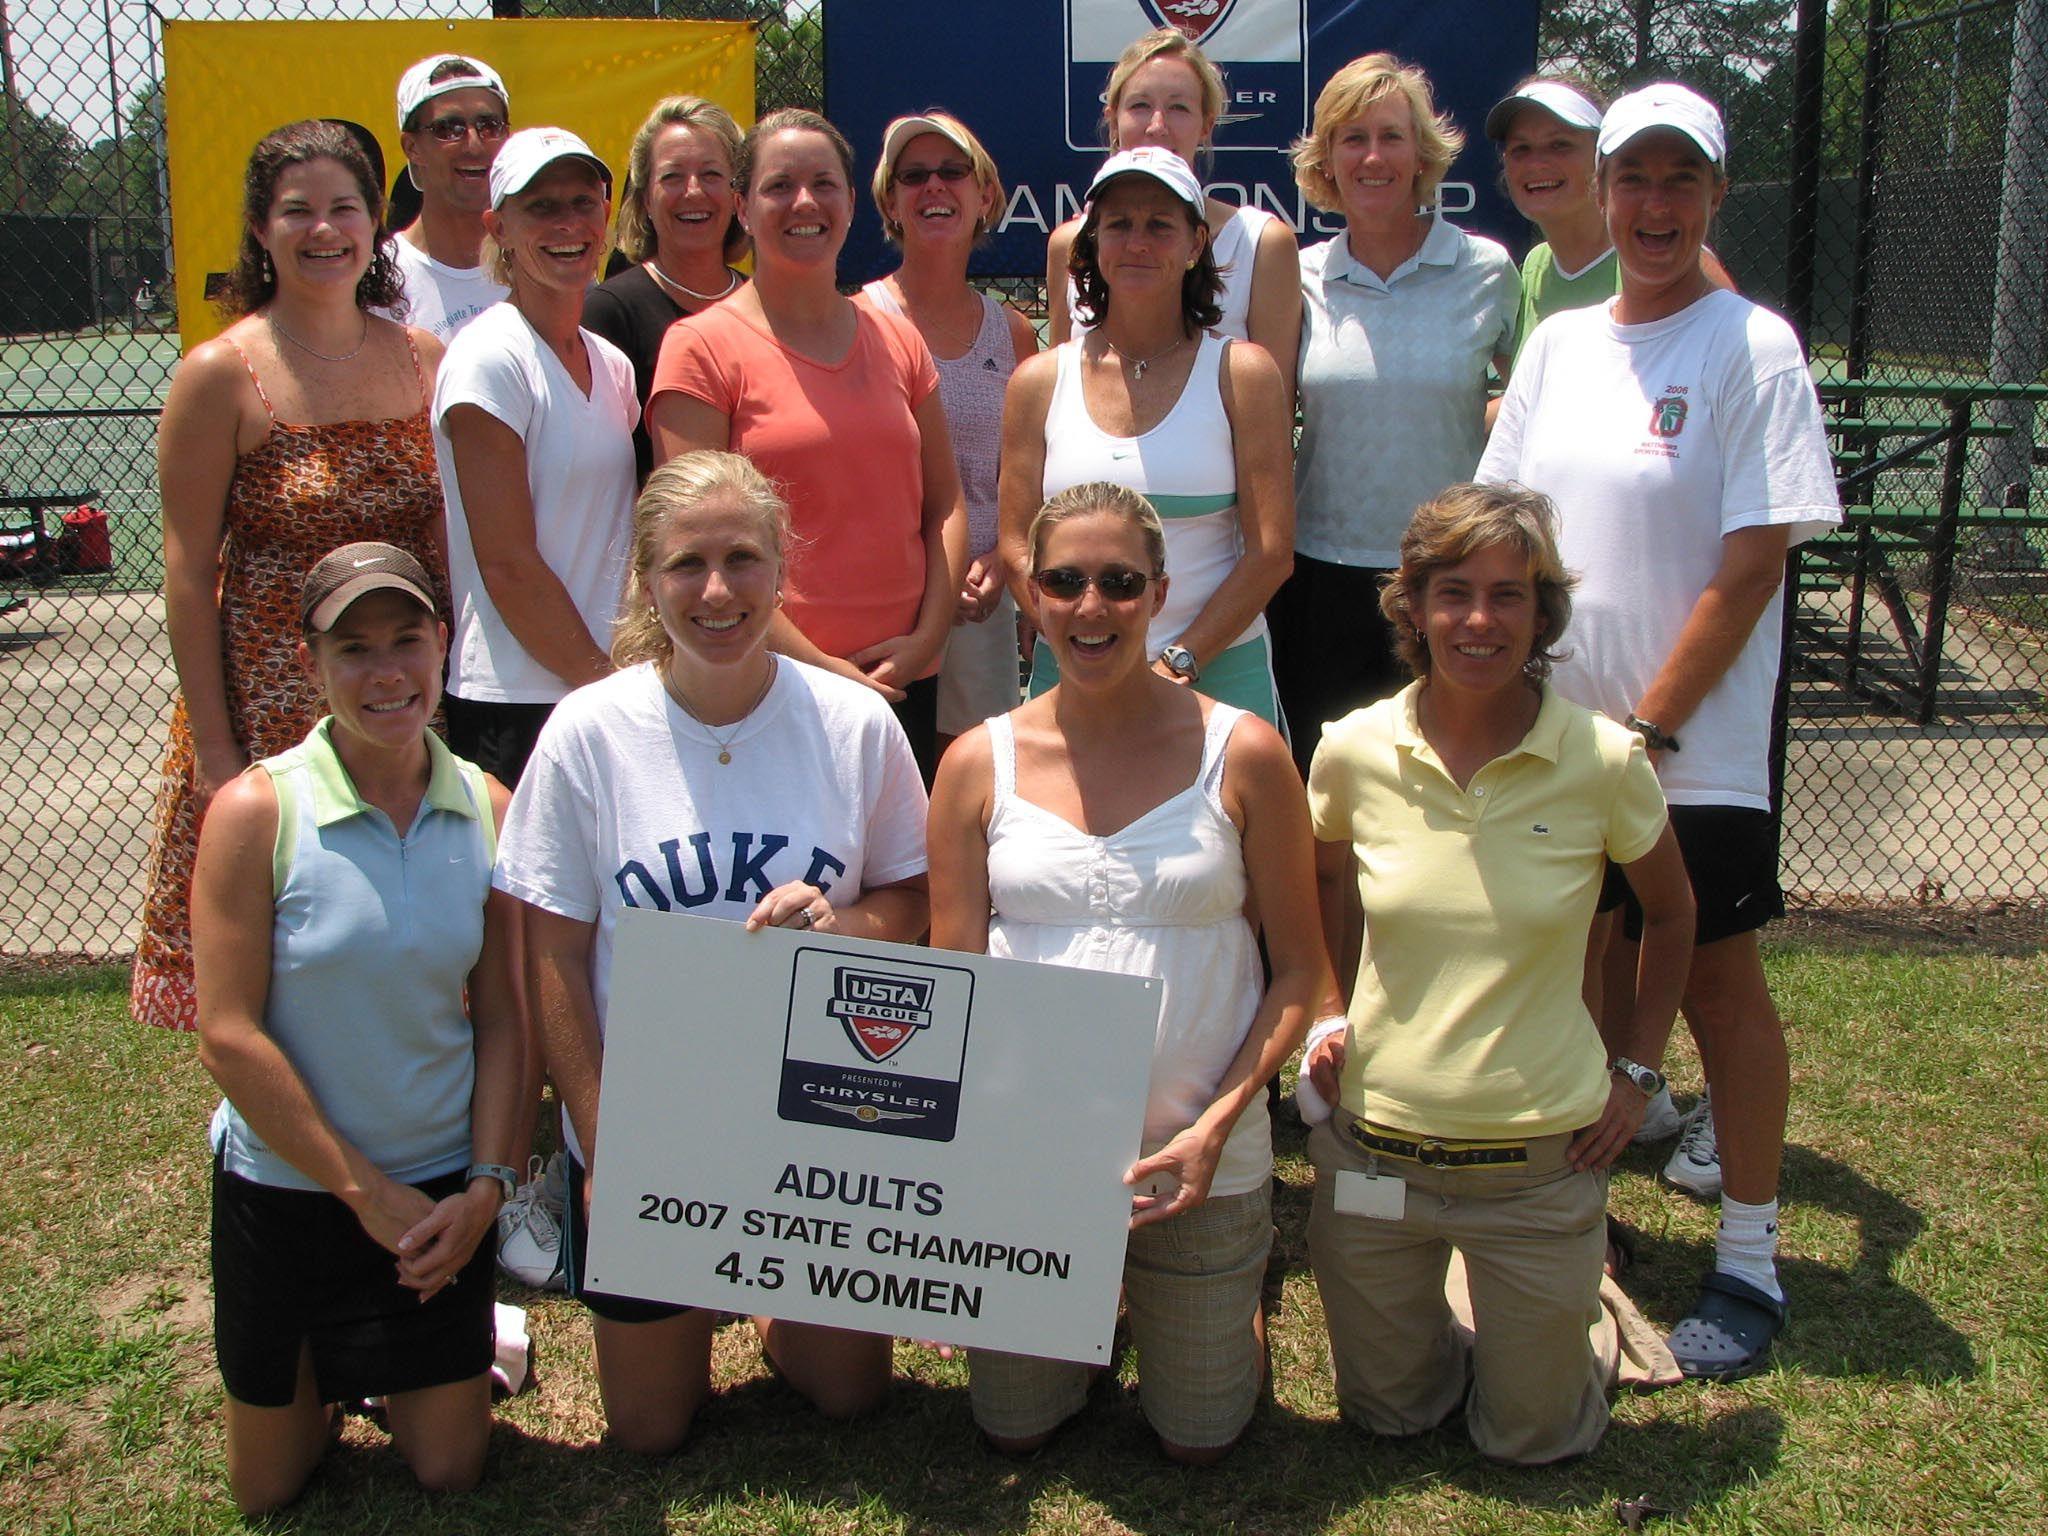 2007 4.5 Adult Women Champs